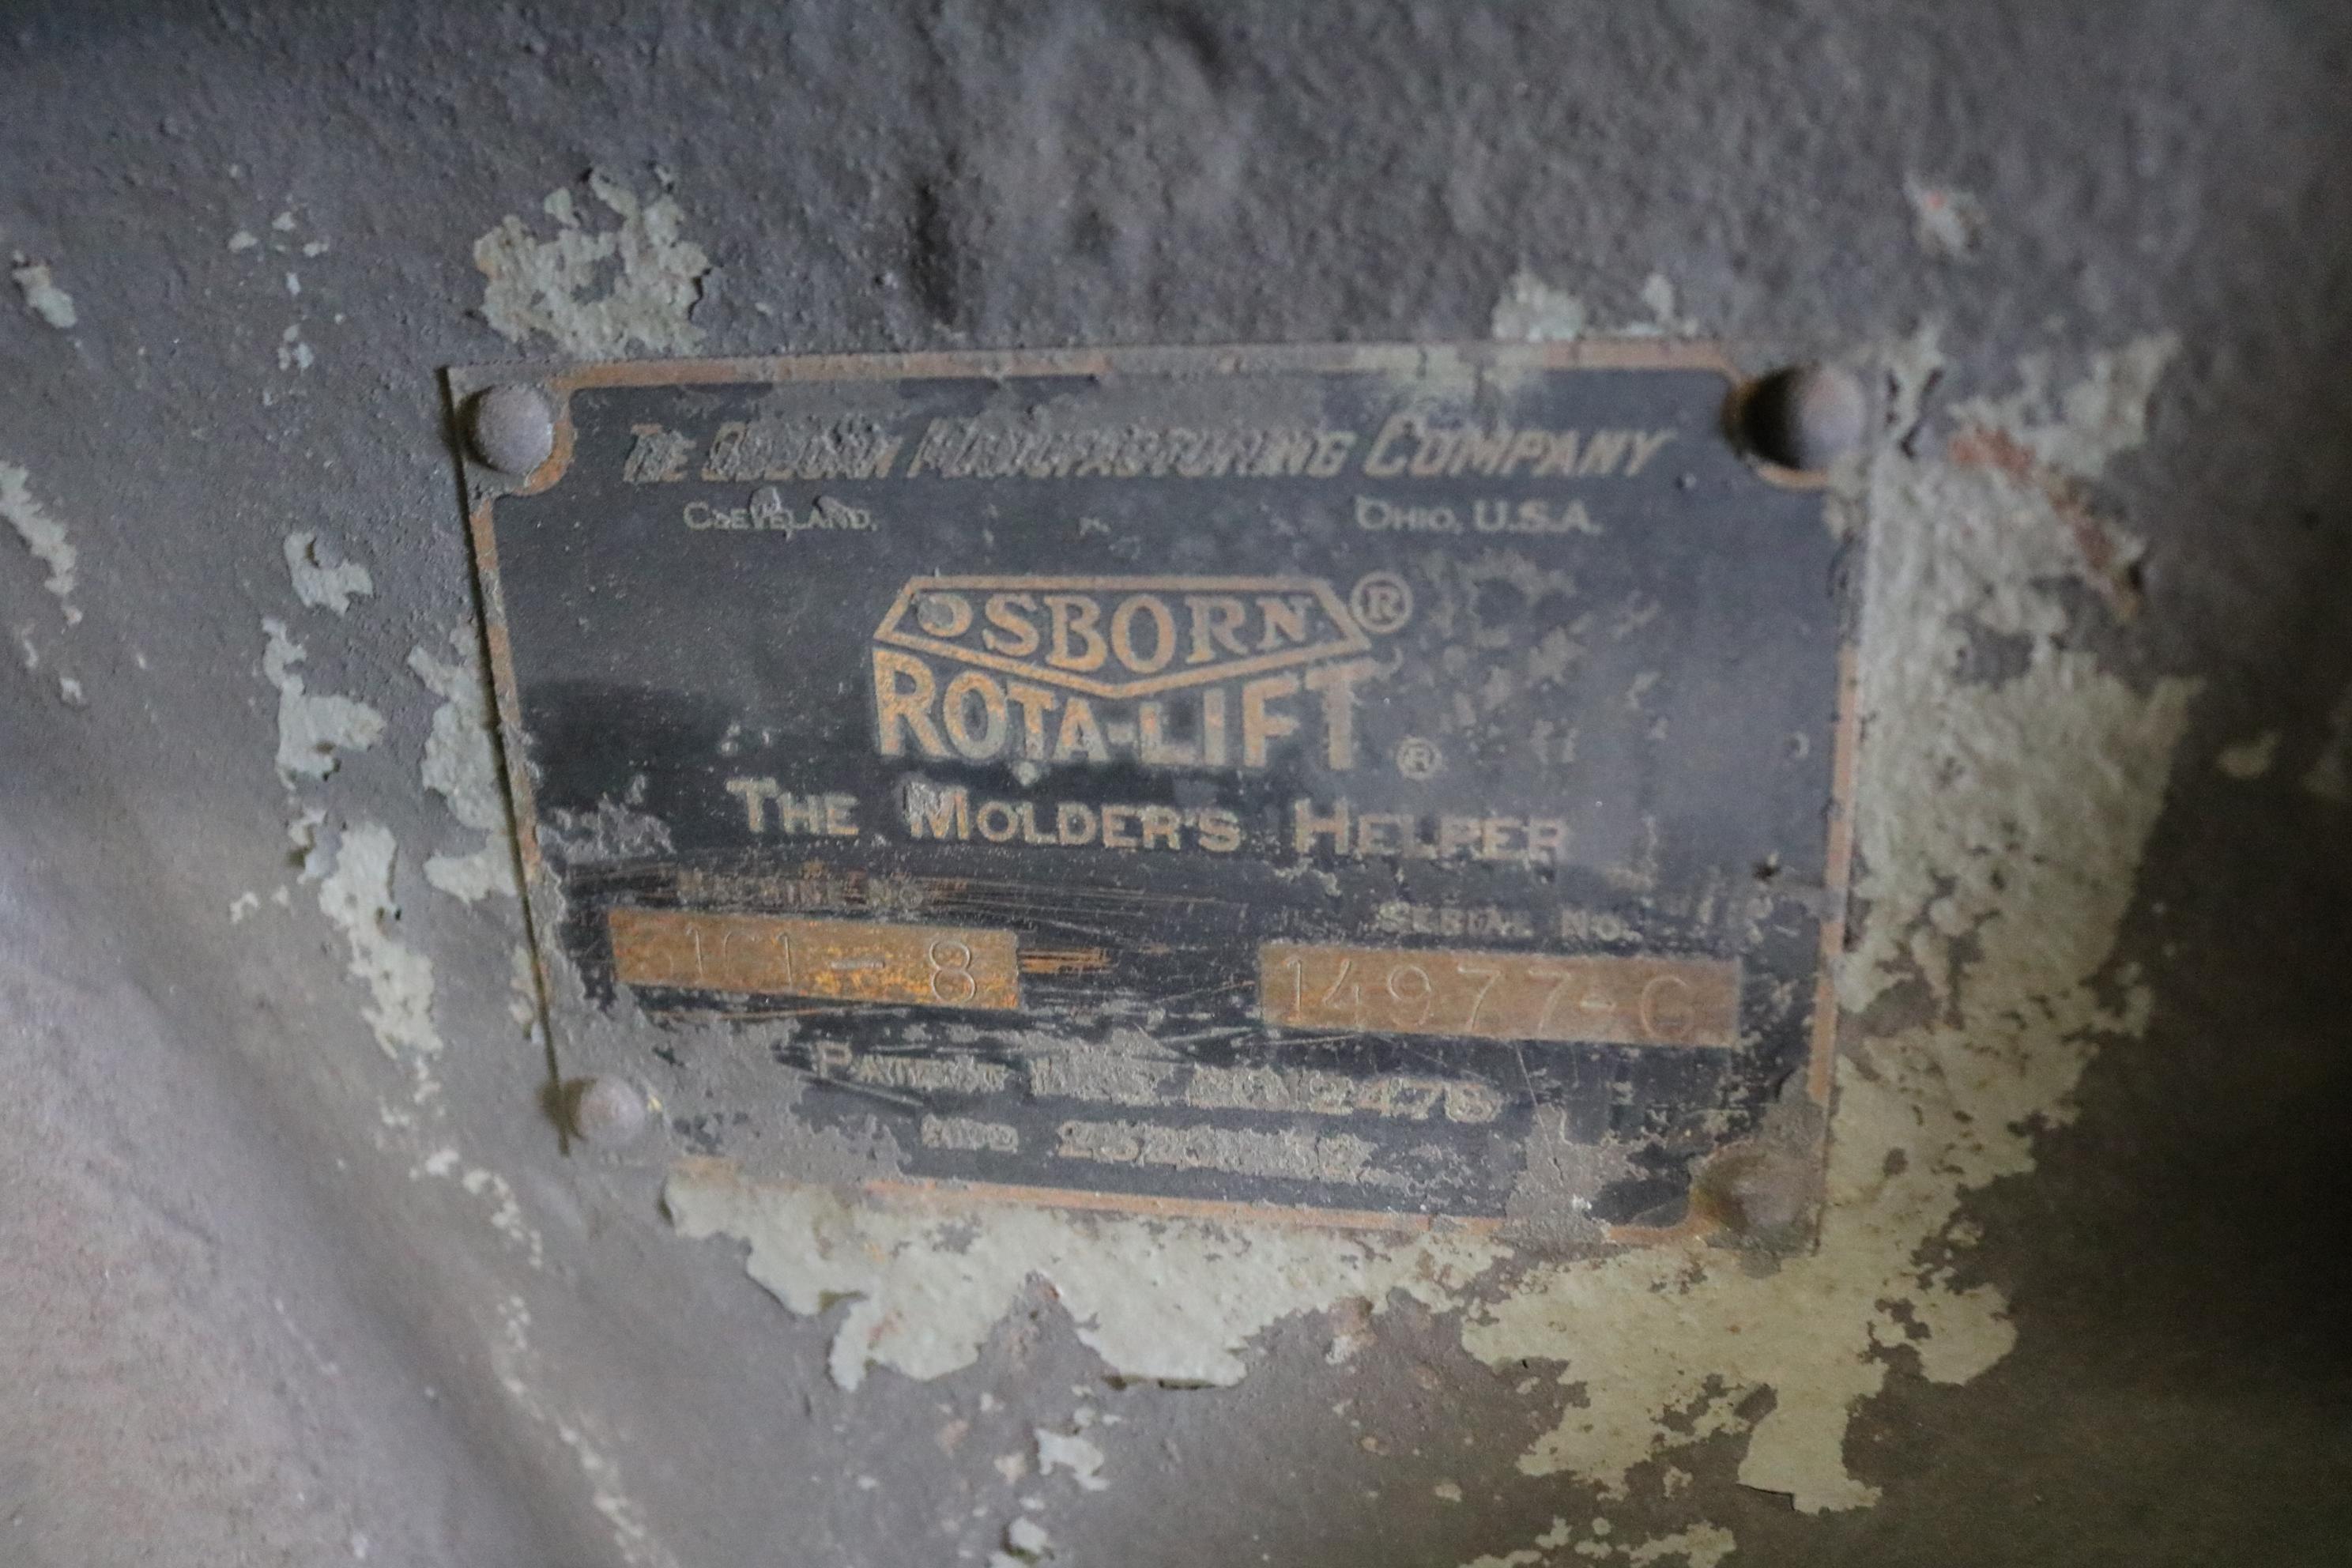 Lot 39 - OSBORN MODEL 3161 RJW ROTOLIFT MOLDING MACHINE, MOLD HANDLER, S/N 14977-C